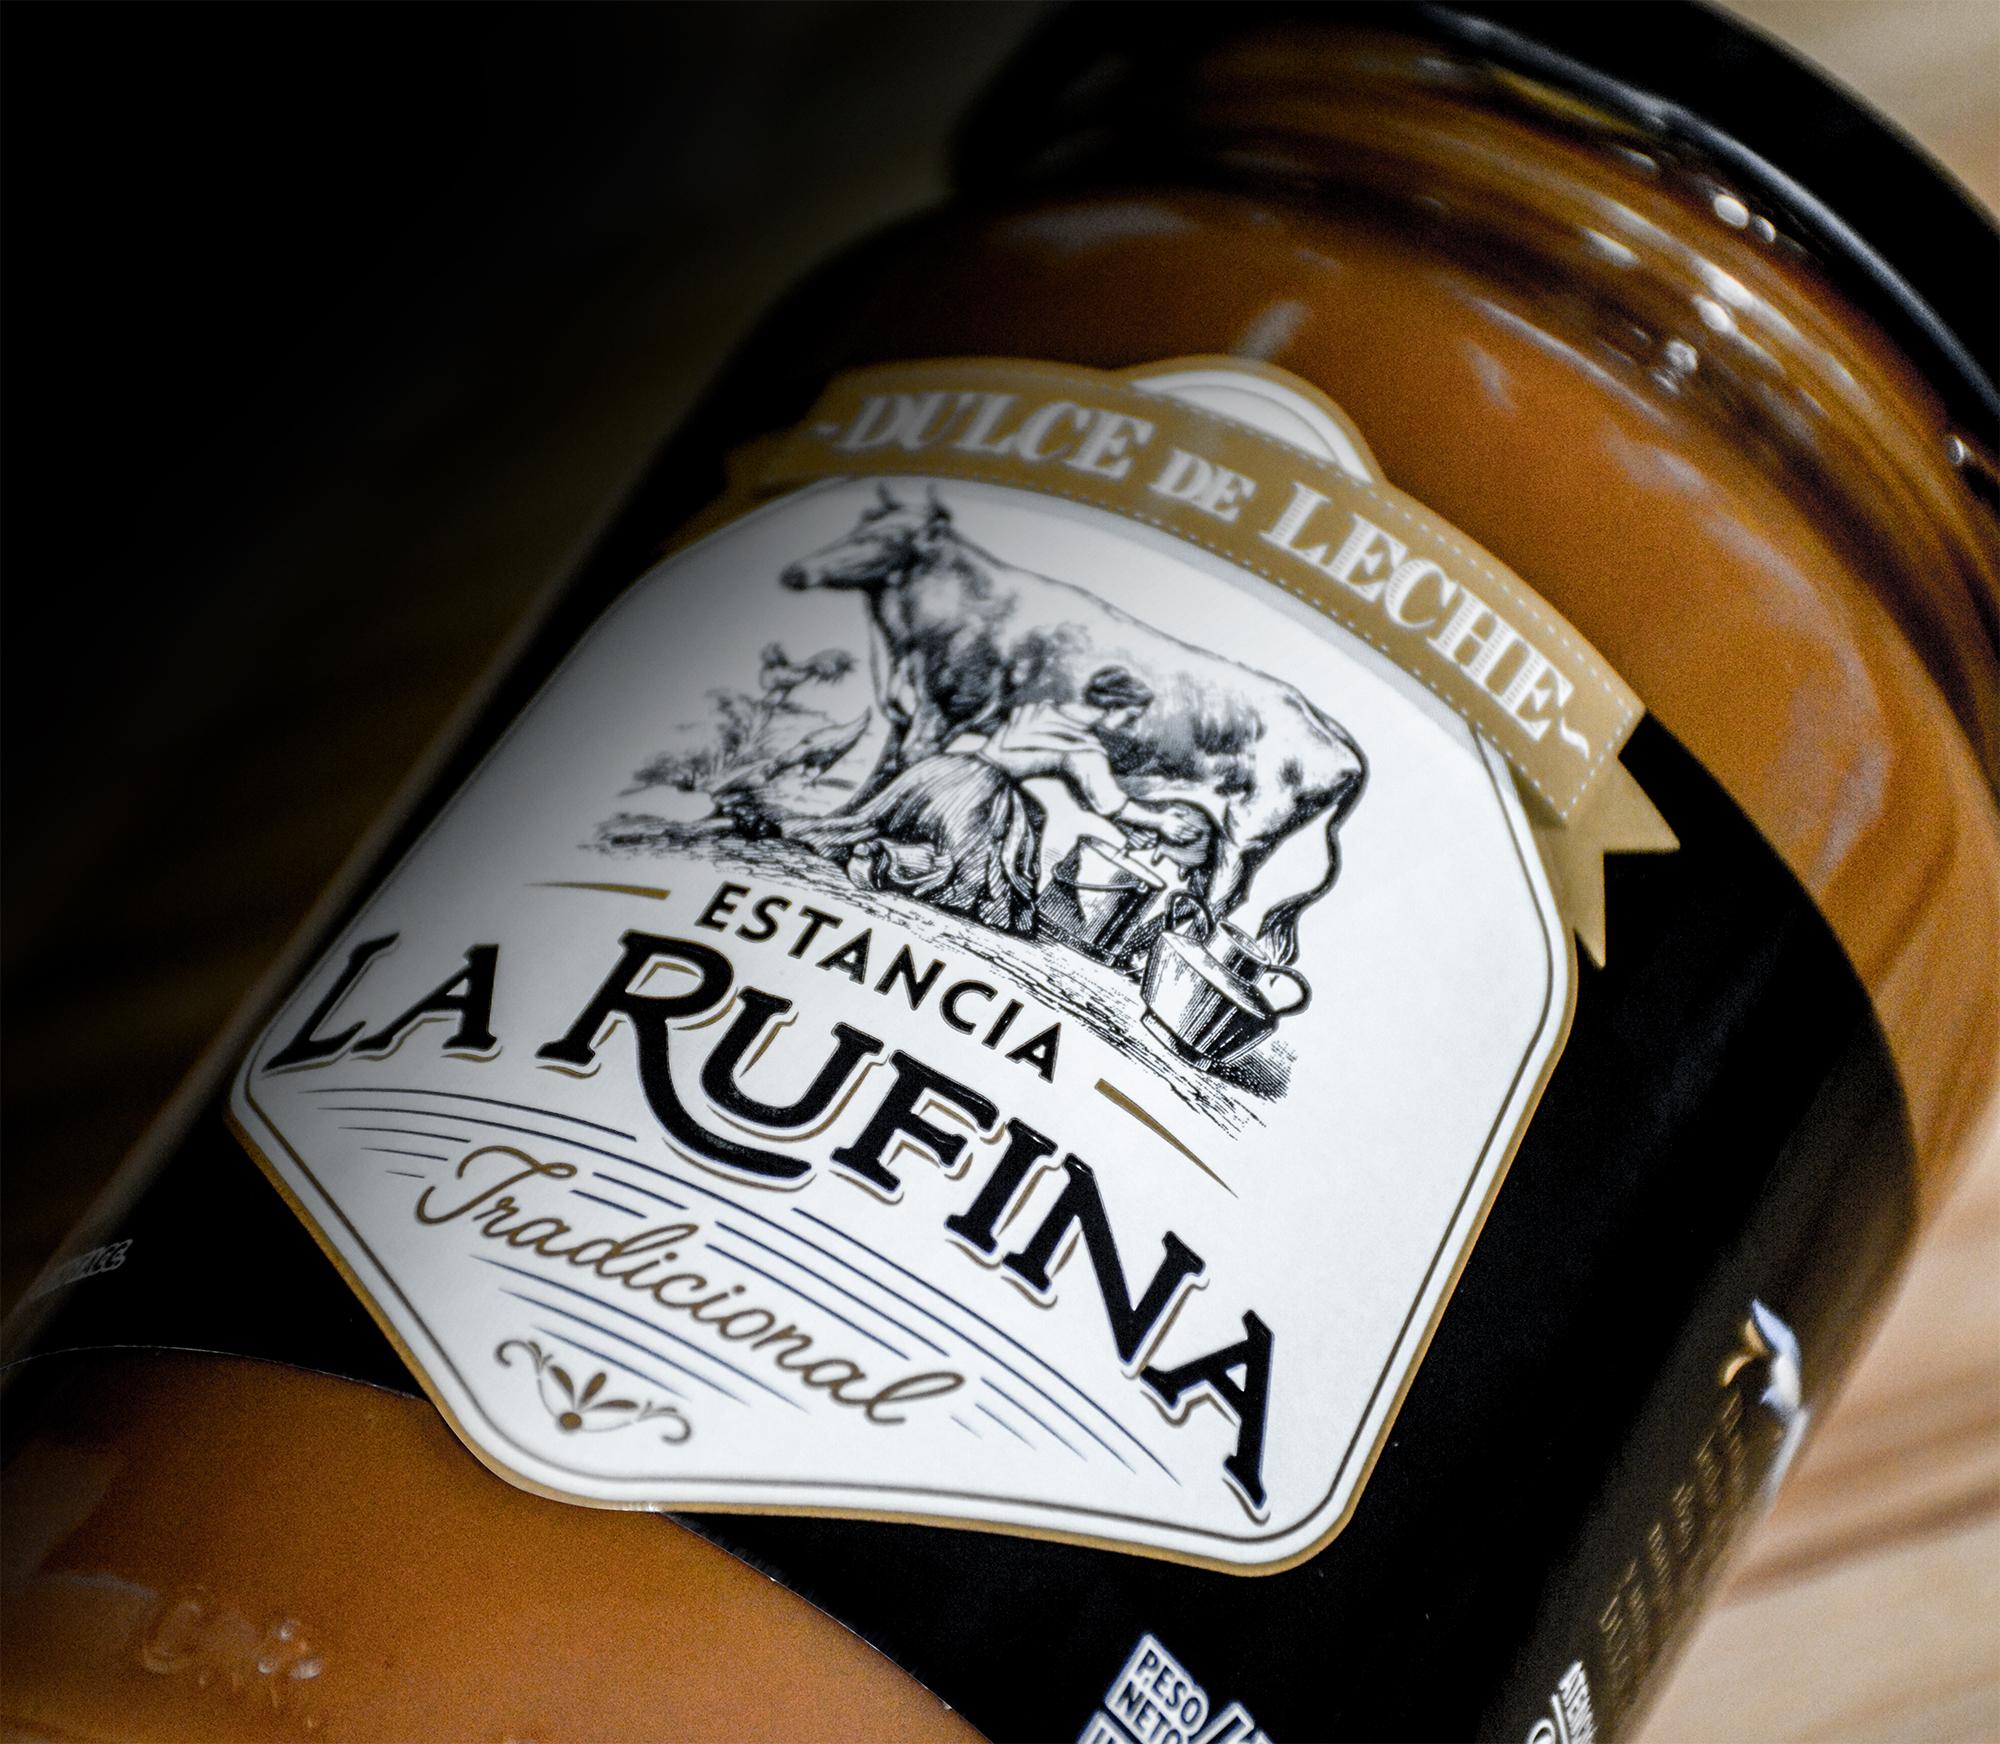 Estancia La Rufina